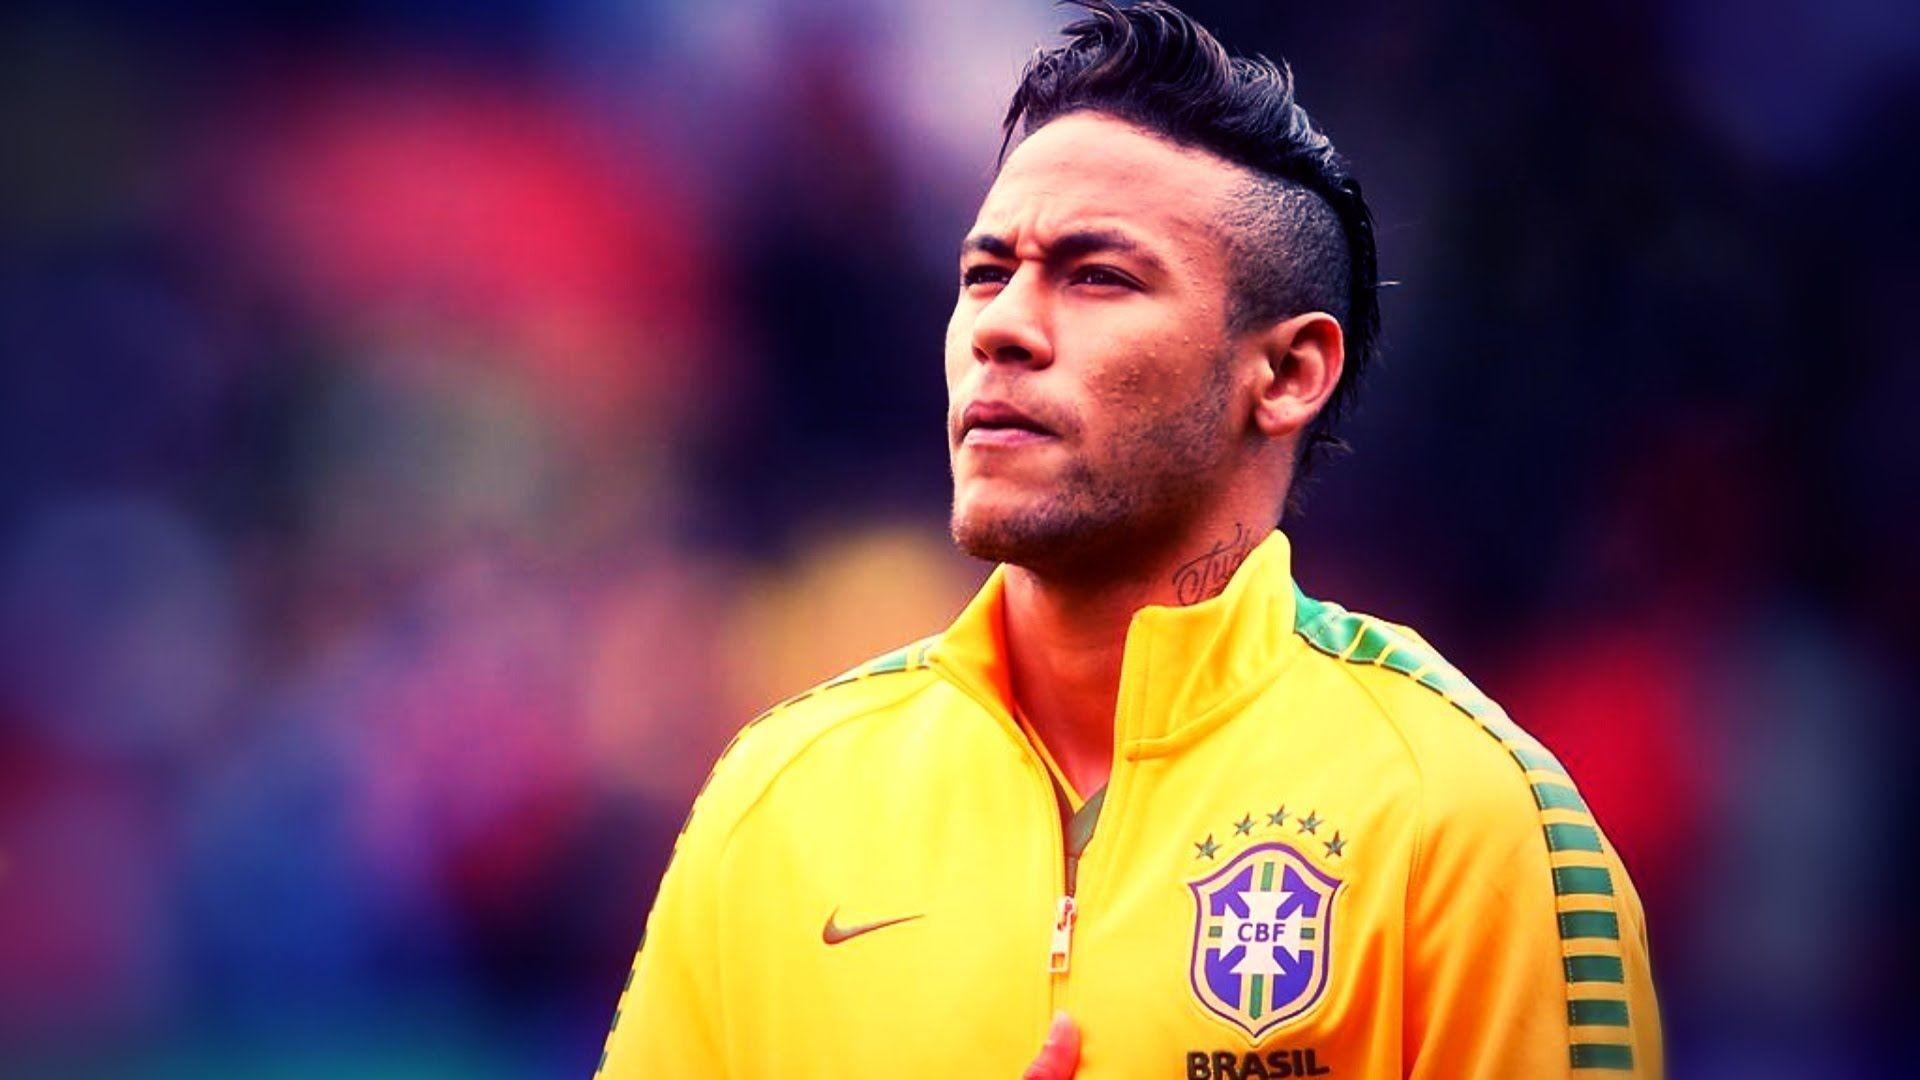 Neymar Barca HD Wallpaper